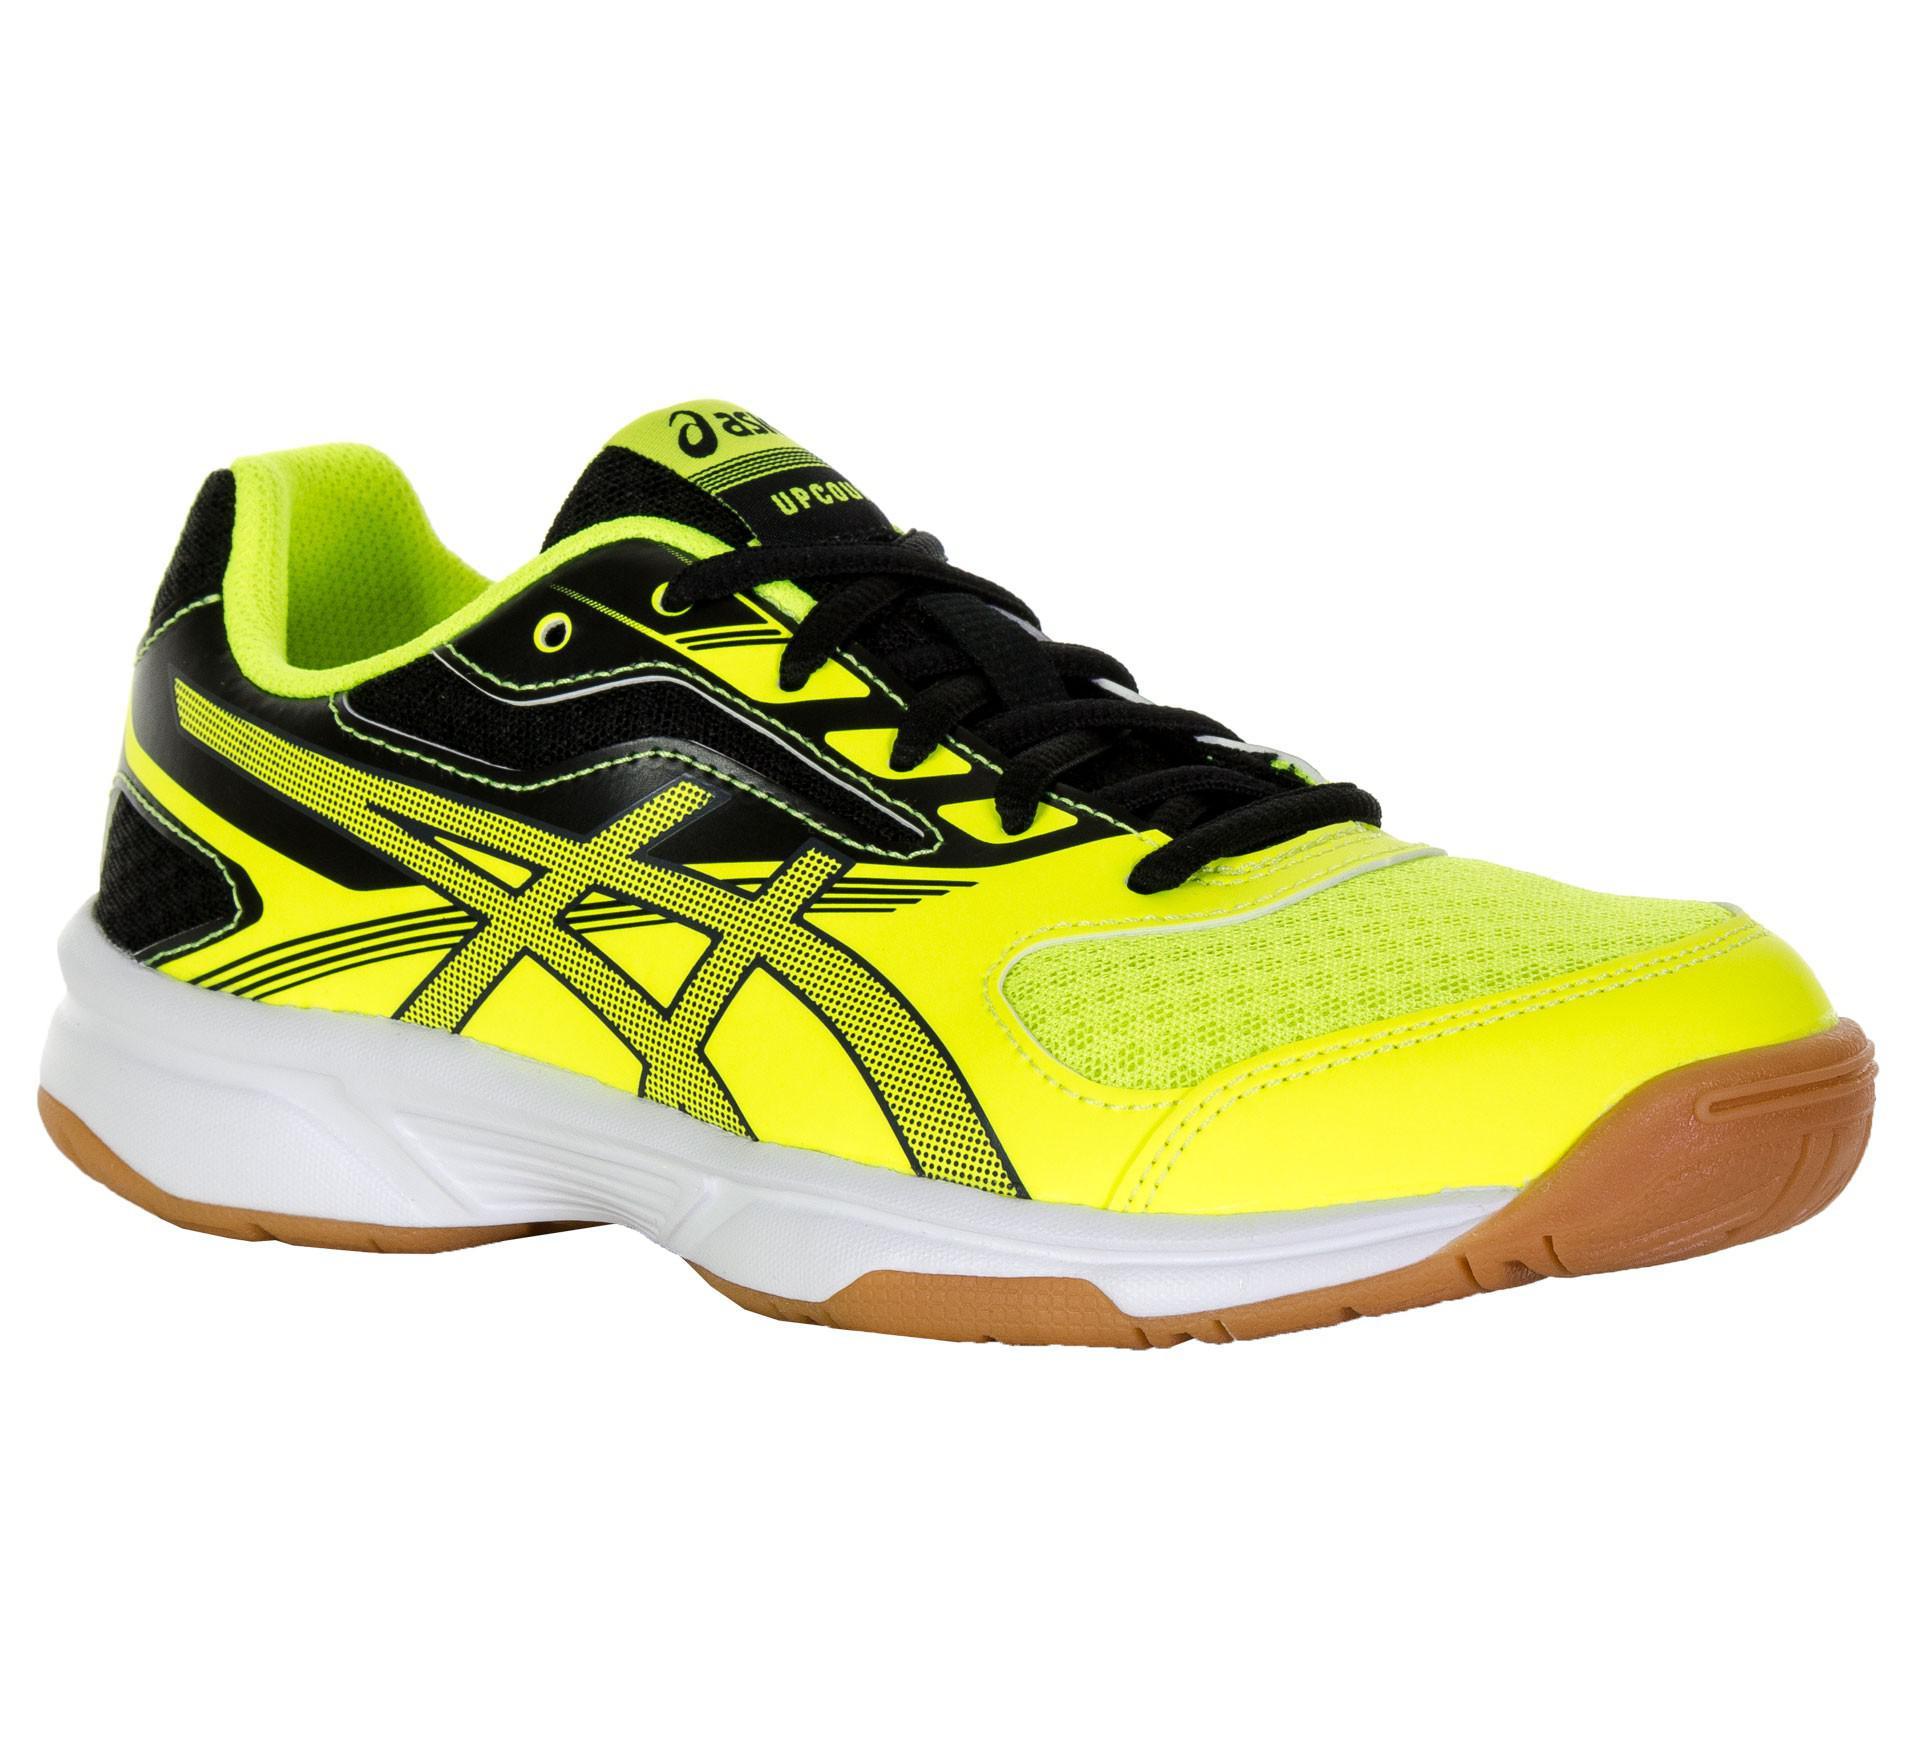 The Best Squash Shoes